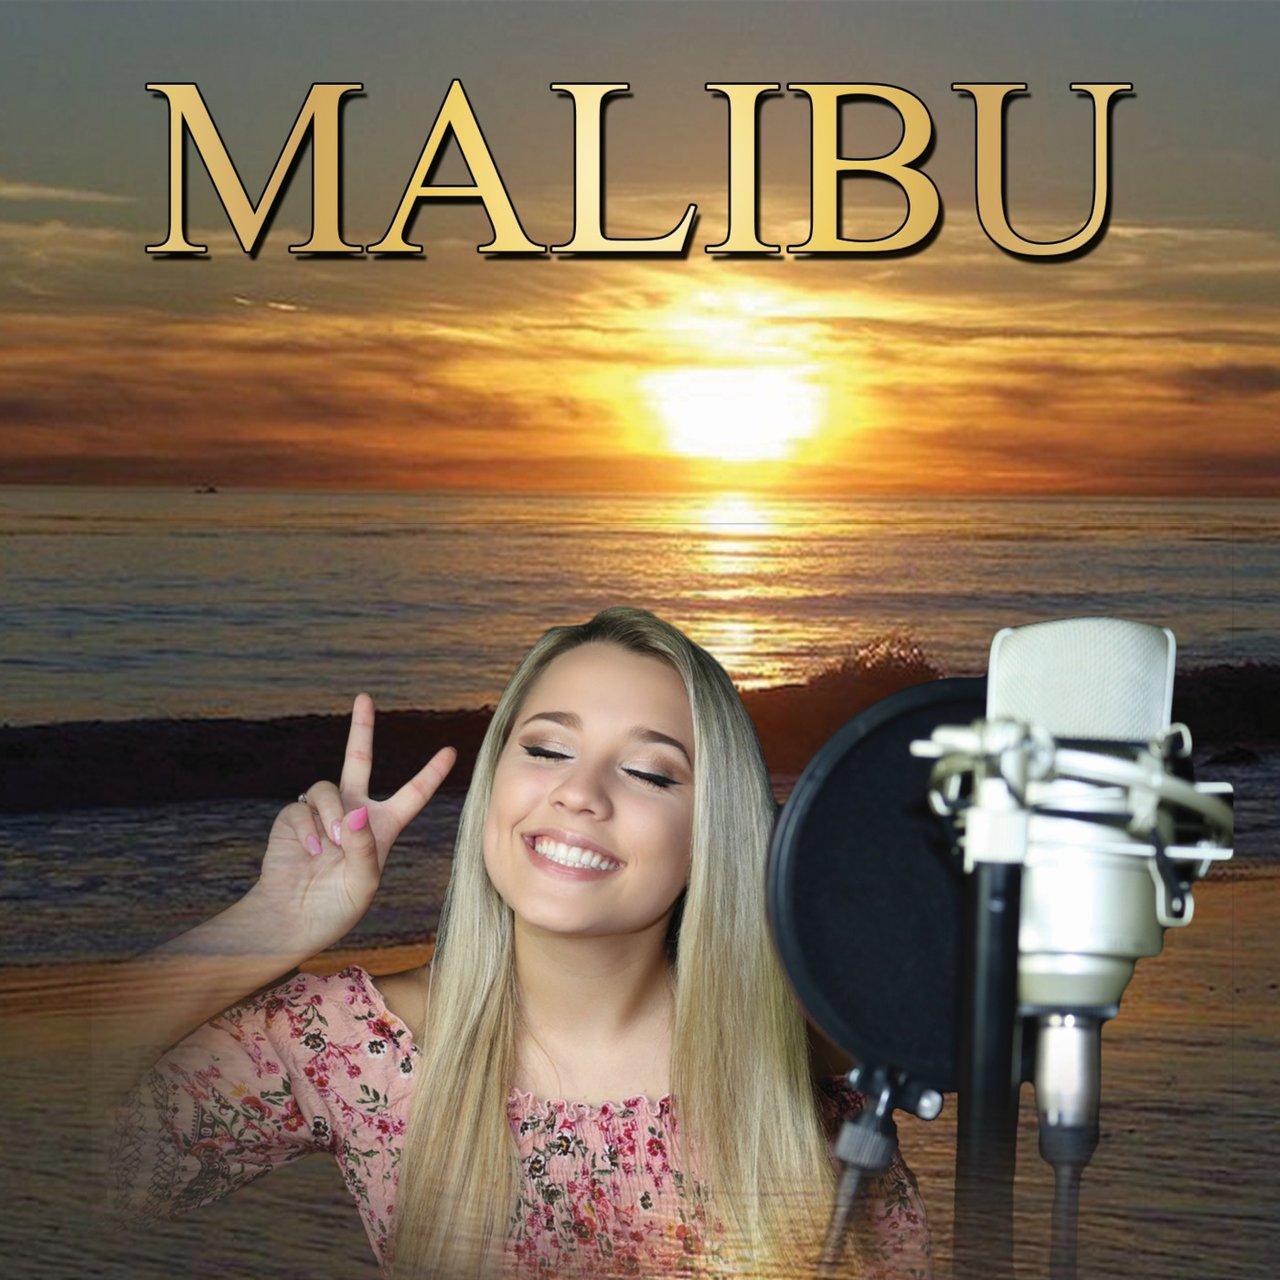 Gabby Barrett - Malibu